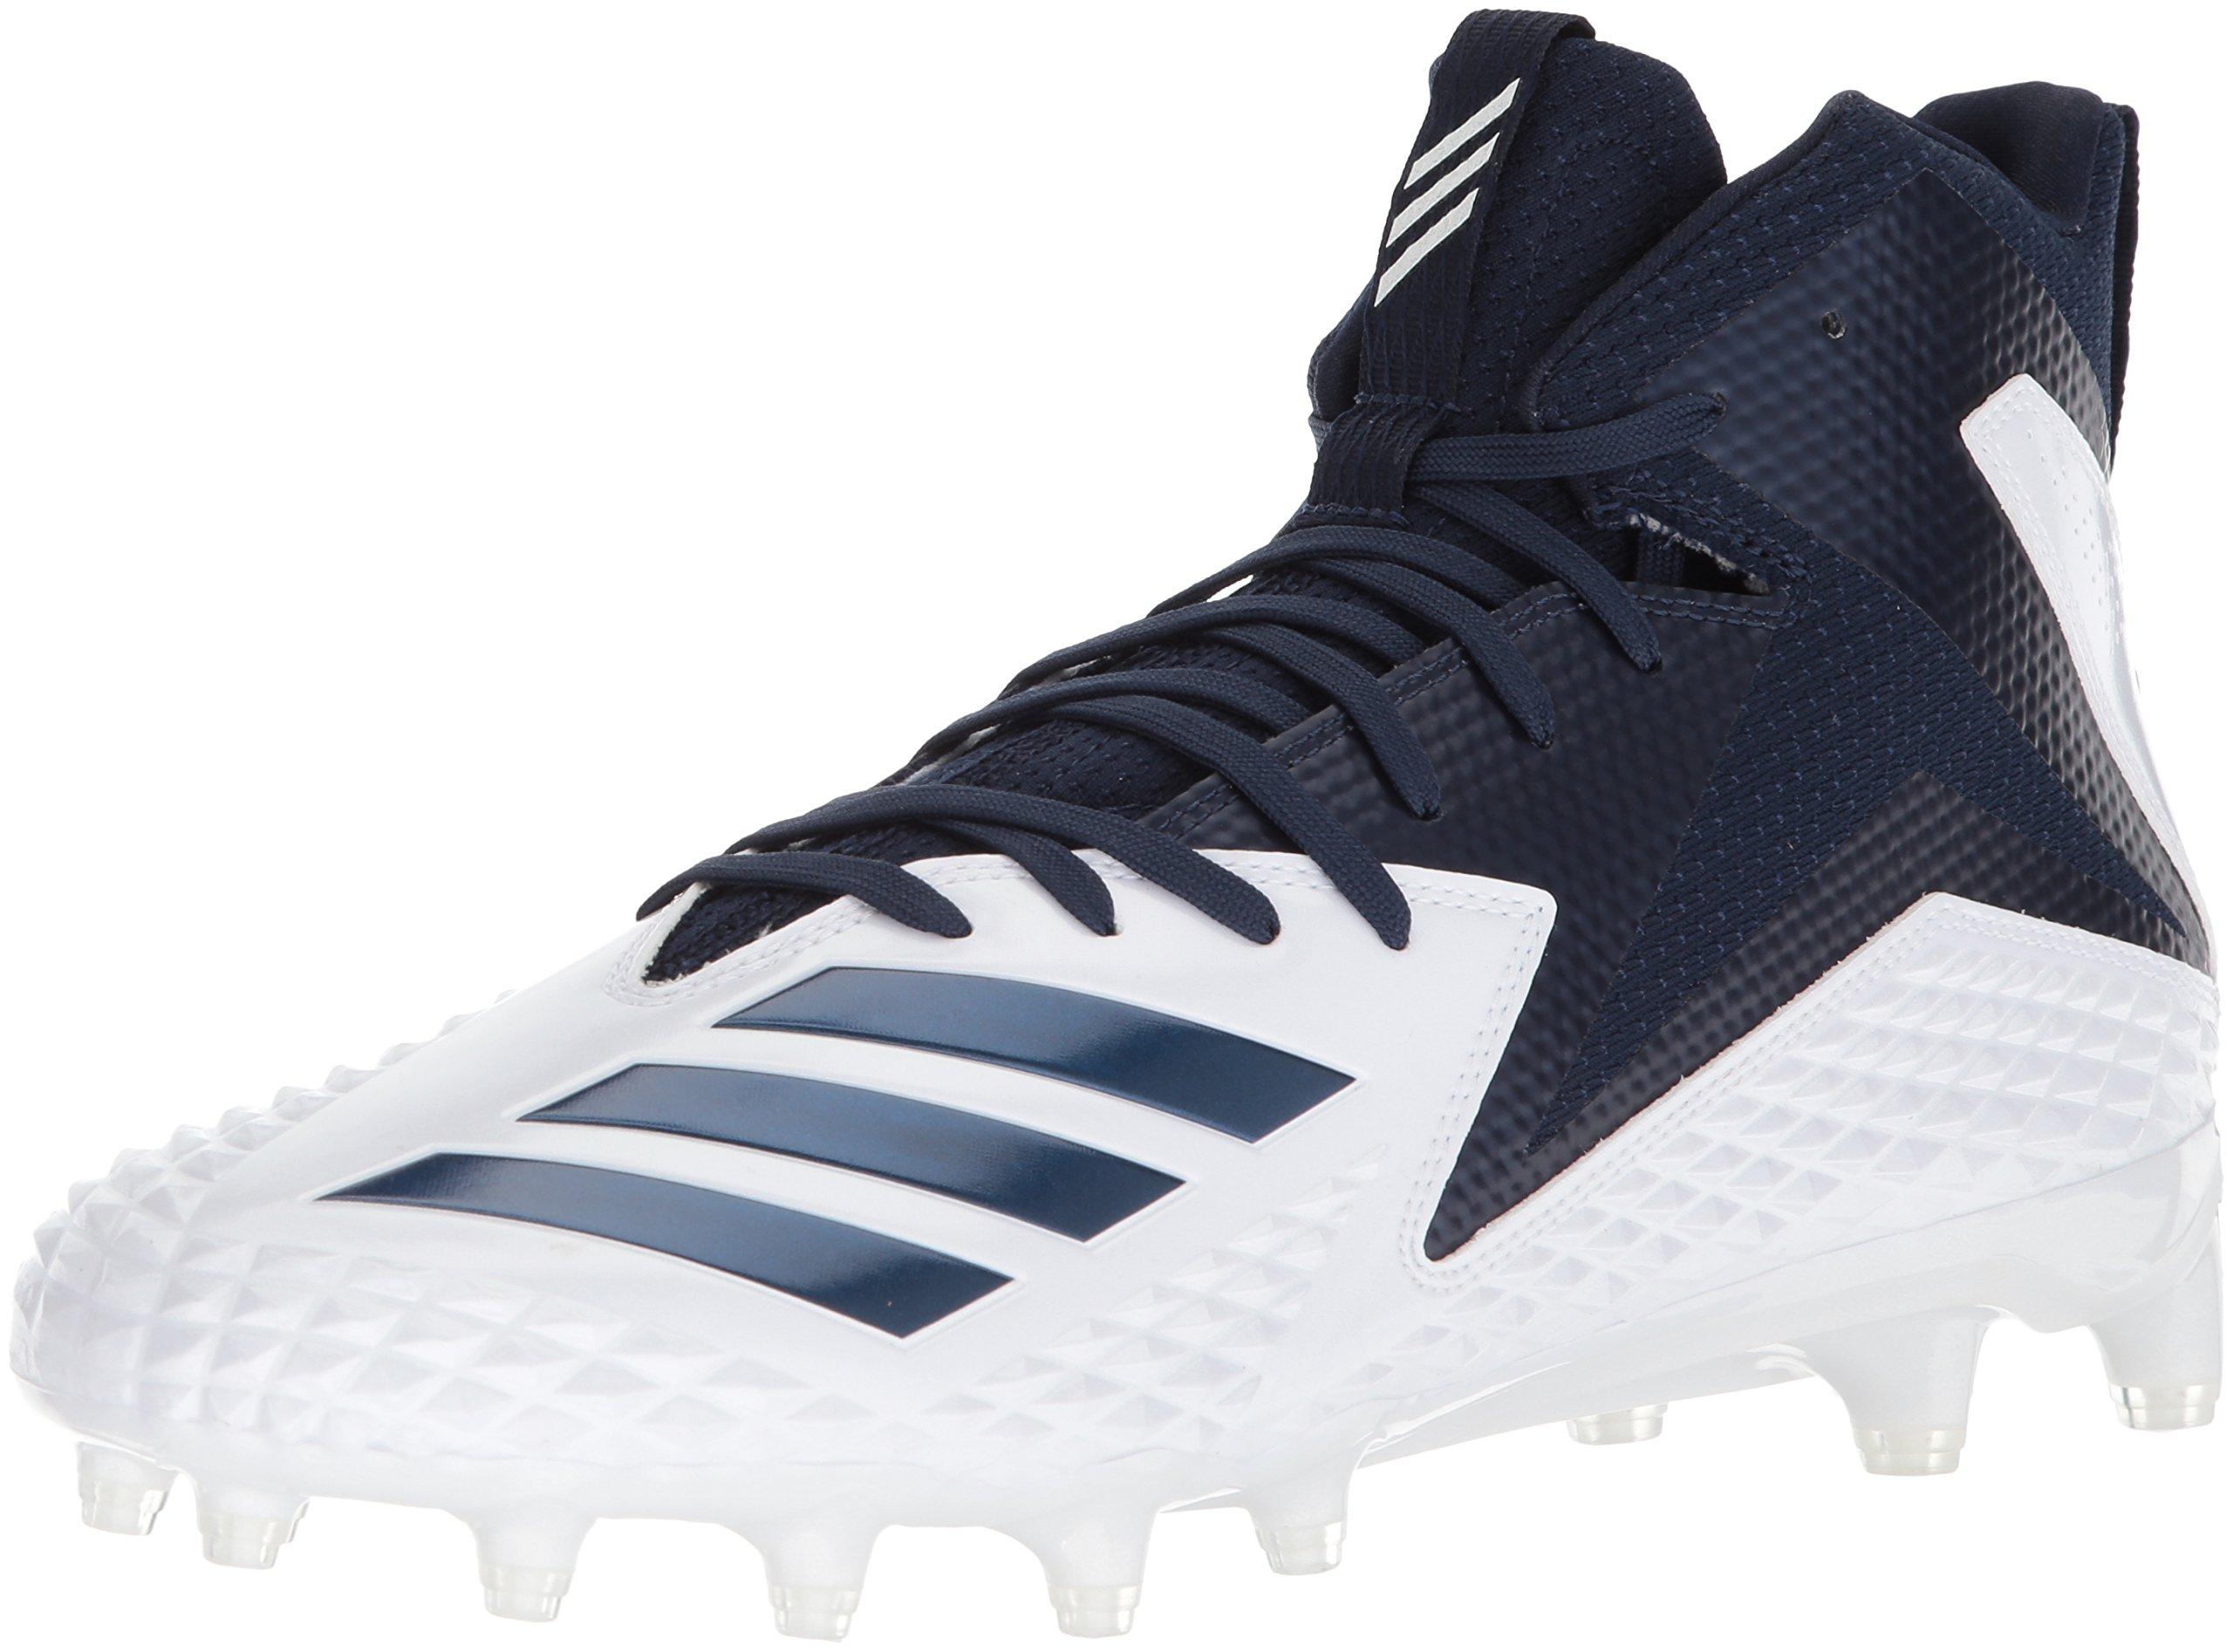 adidas Men's Freak X Carbon Mid Football Shoe, White/Collegiate Navy/Collegiate Navy, 11.5 M US